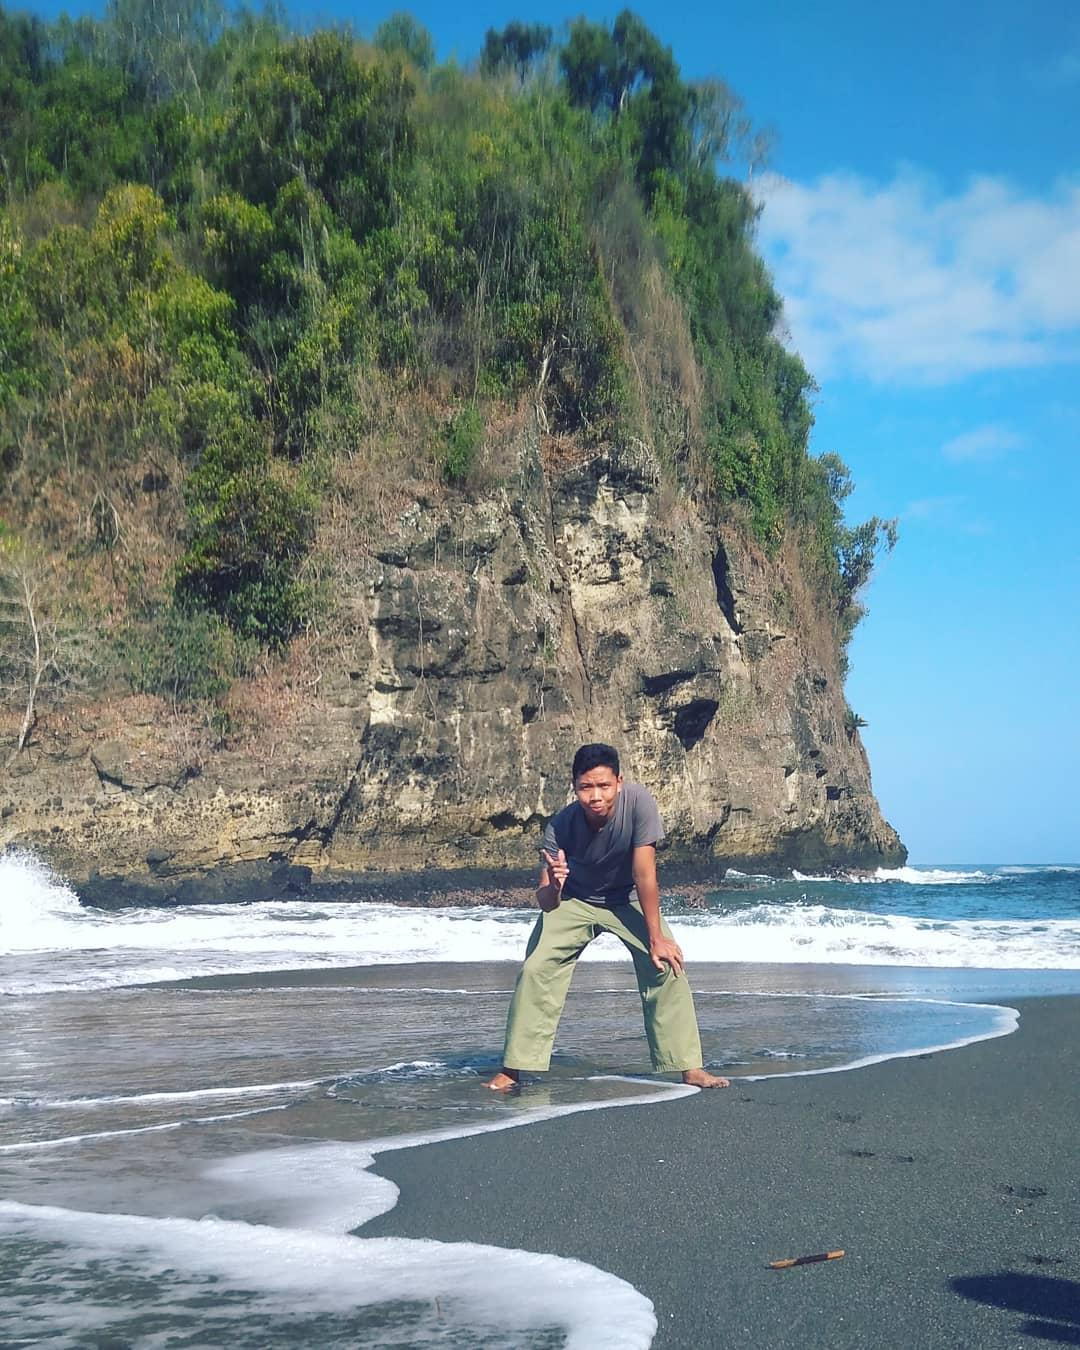 berfoto dengan background pemandangan pantai licin